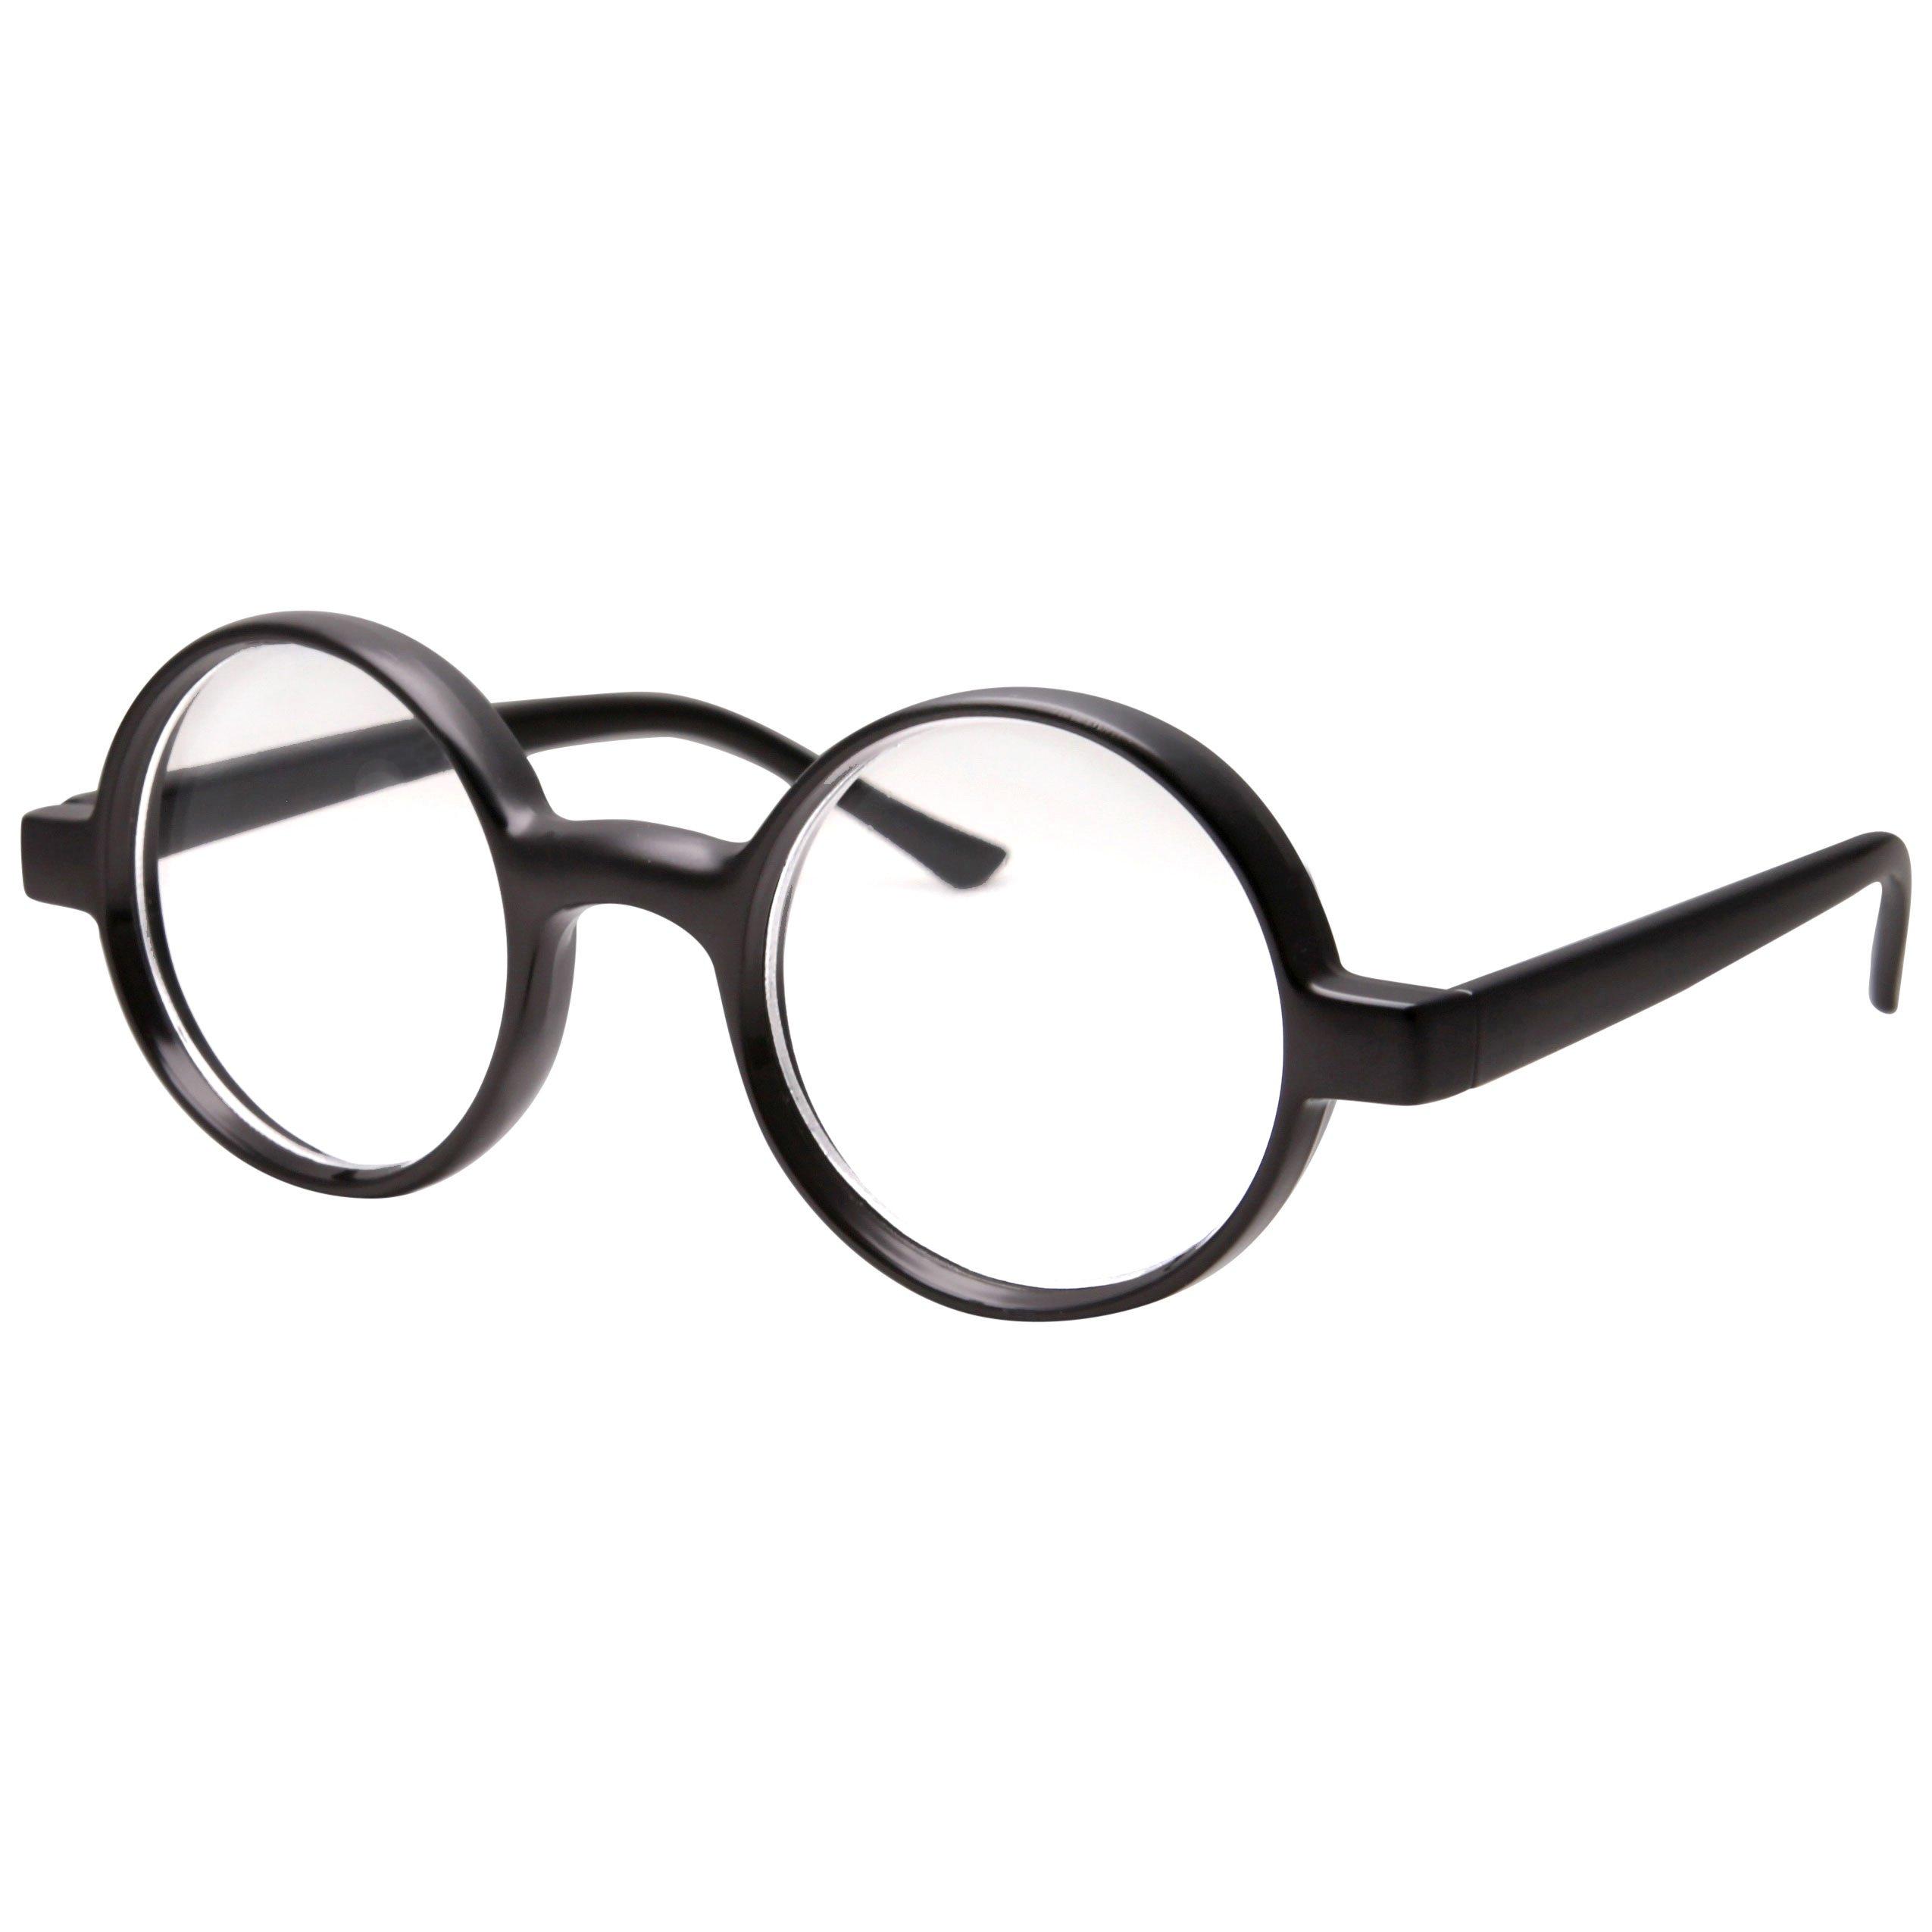 5b6cfcfc6a Buy Kids Childrens Wizard Nerd Round Black Frame Glasses